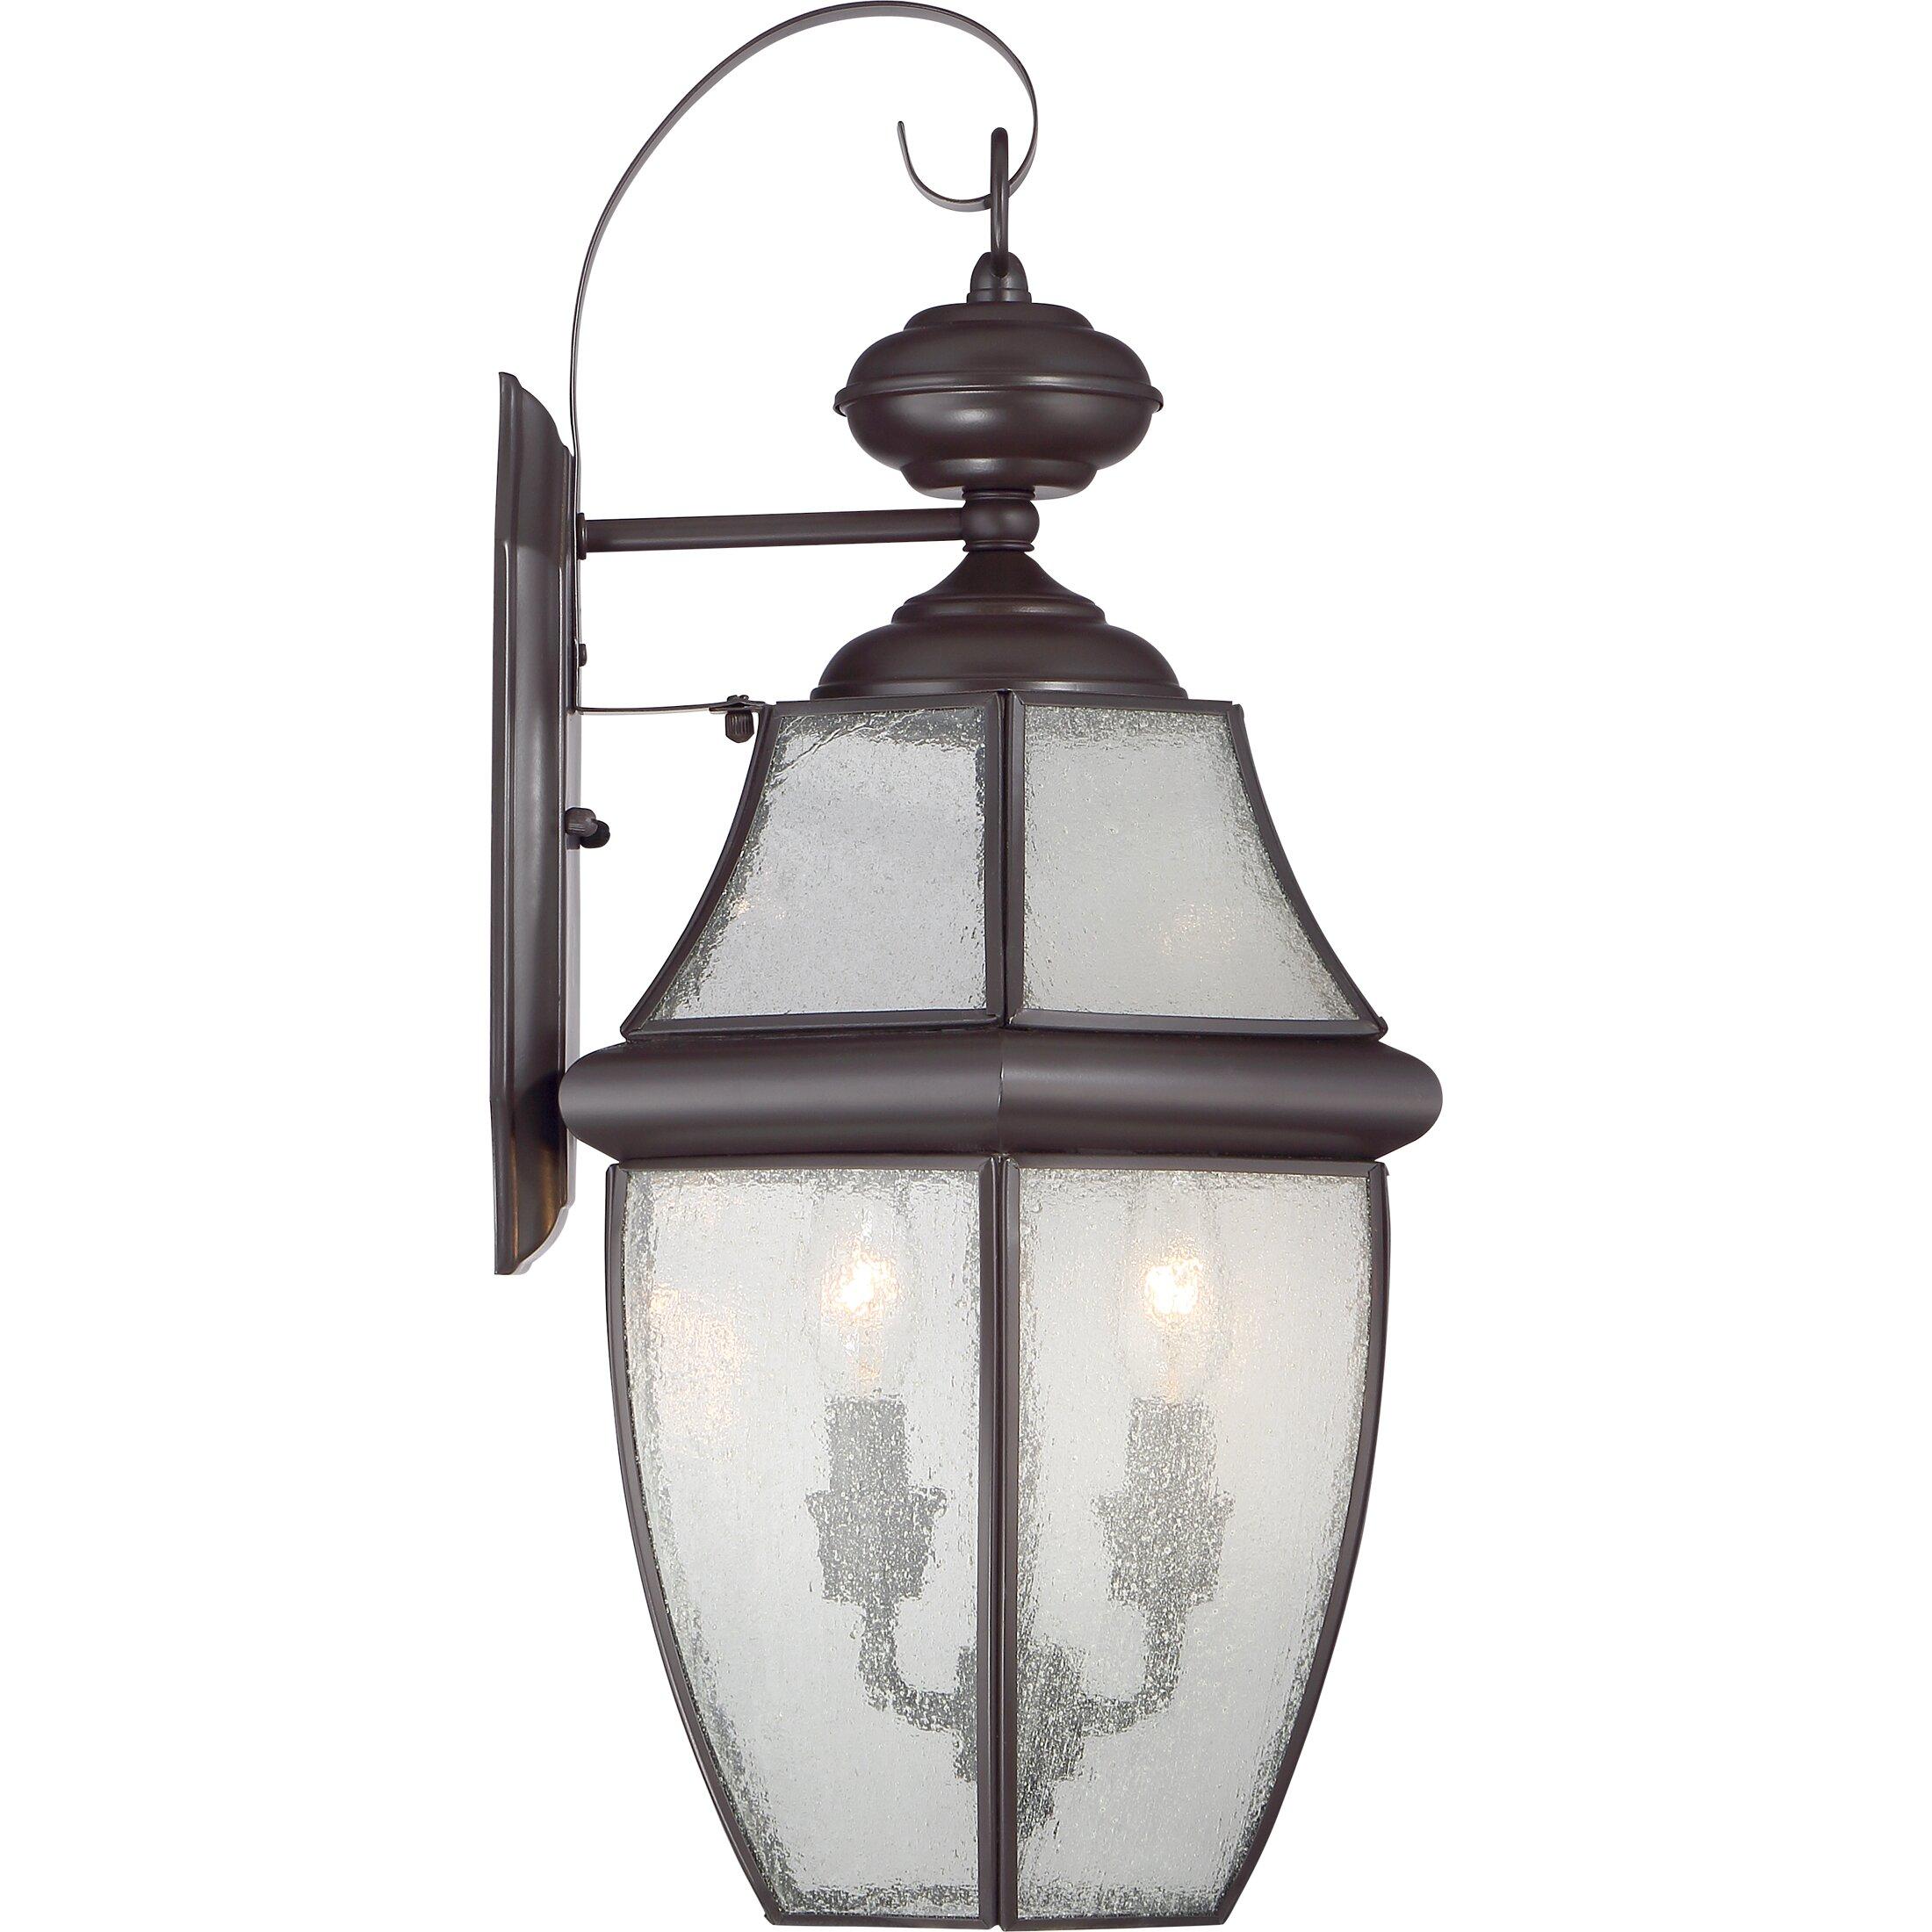 Darby Home Co Saddler 2 Light Outdoor Wall Lantern & Reviews Wayfair